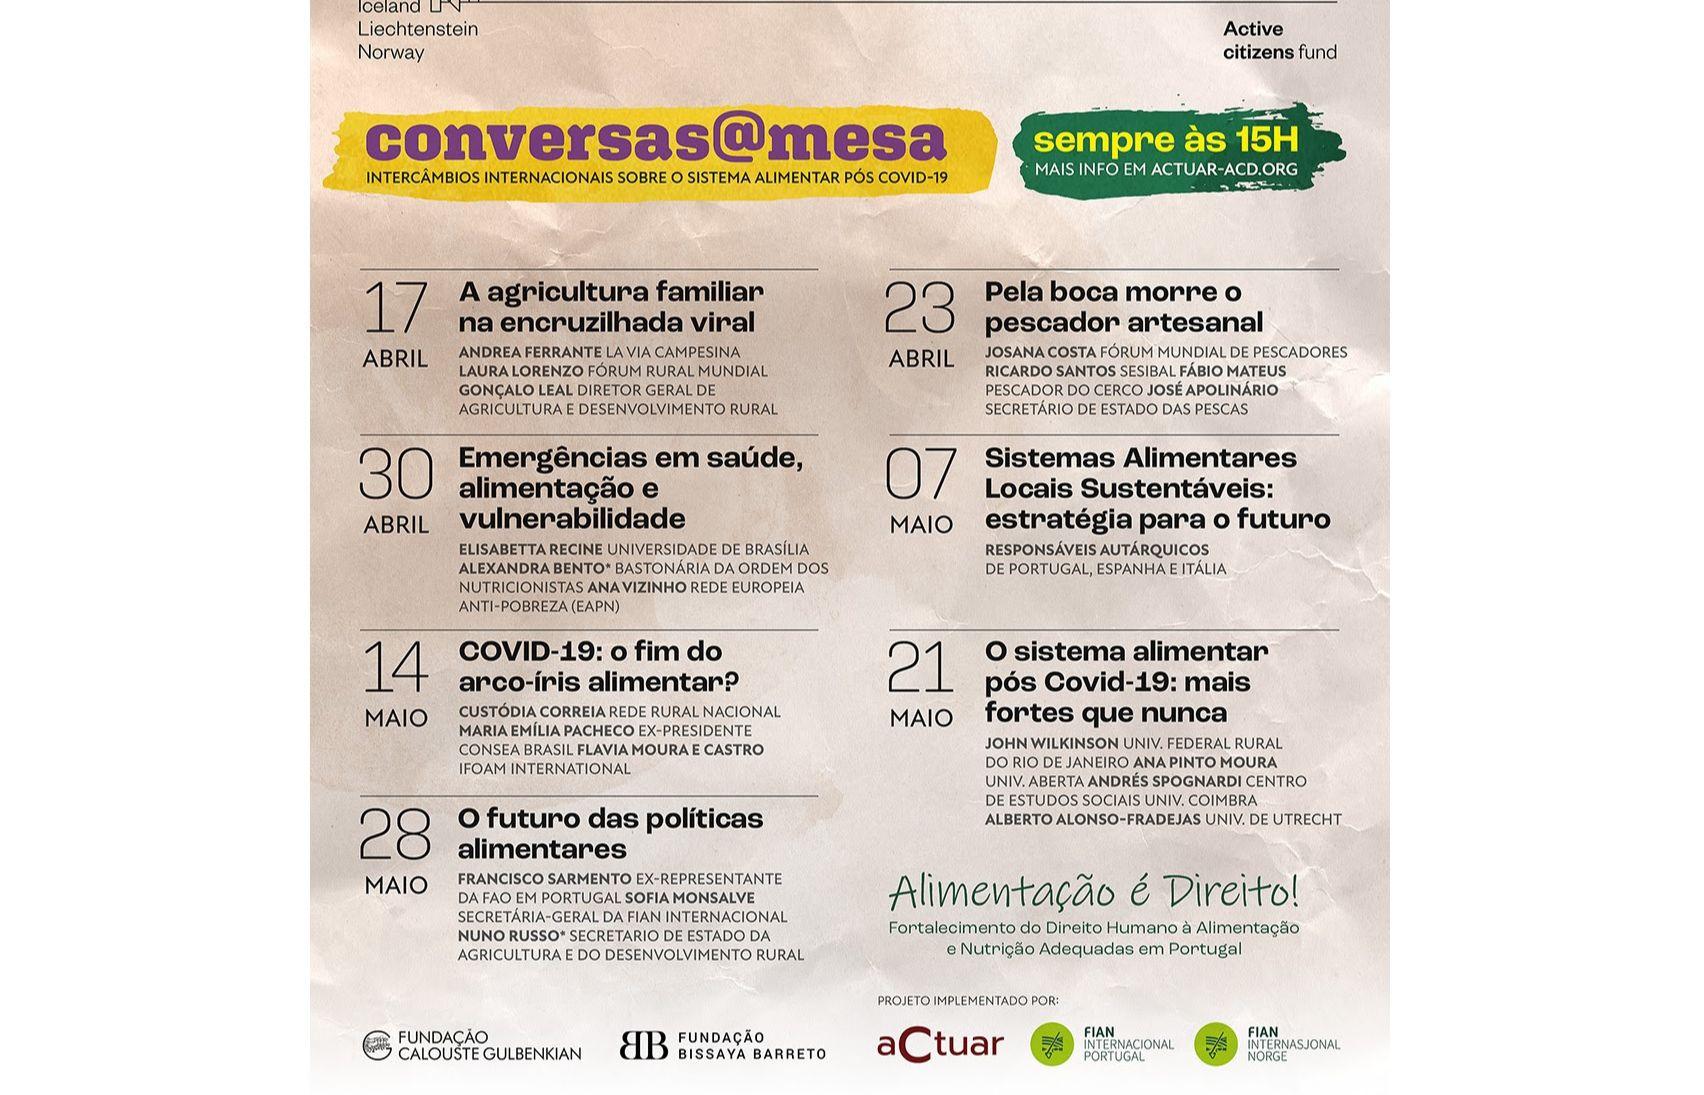 Conversas à mesa - Intercâmbios Internacionais sobre o Sistema Alimentar Pós Covid-19